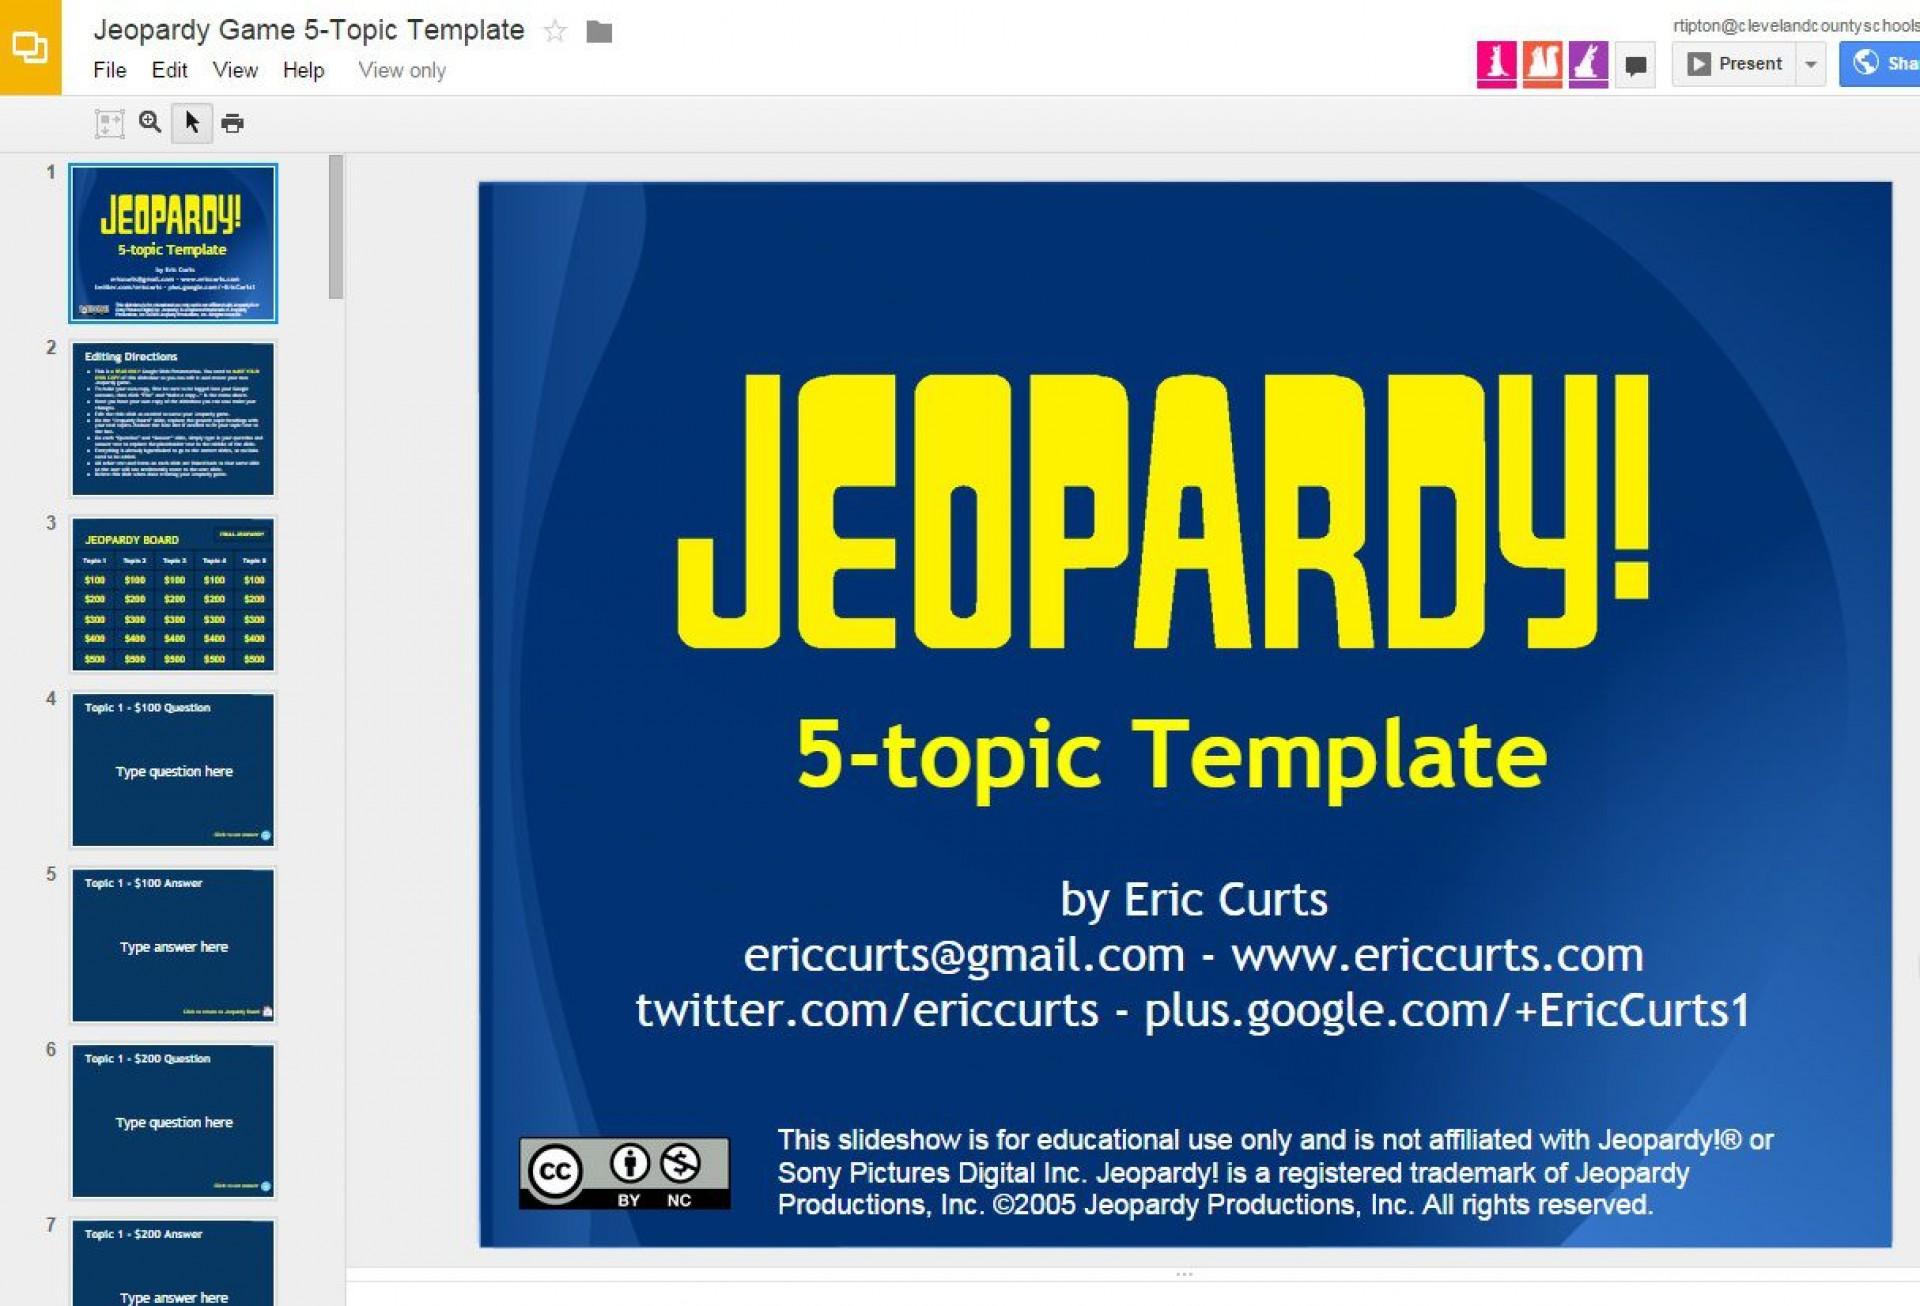 005 Impressive Jeopardy Template Google Slide High Resolution  Slides Board Blank Best1920